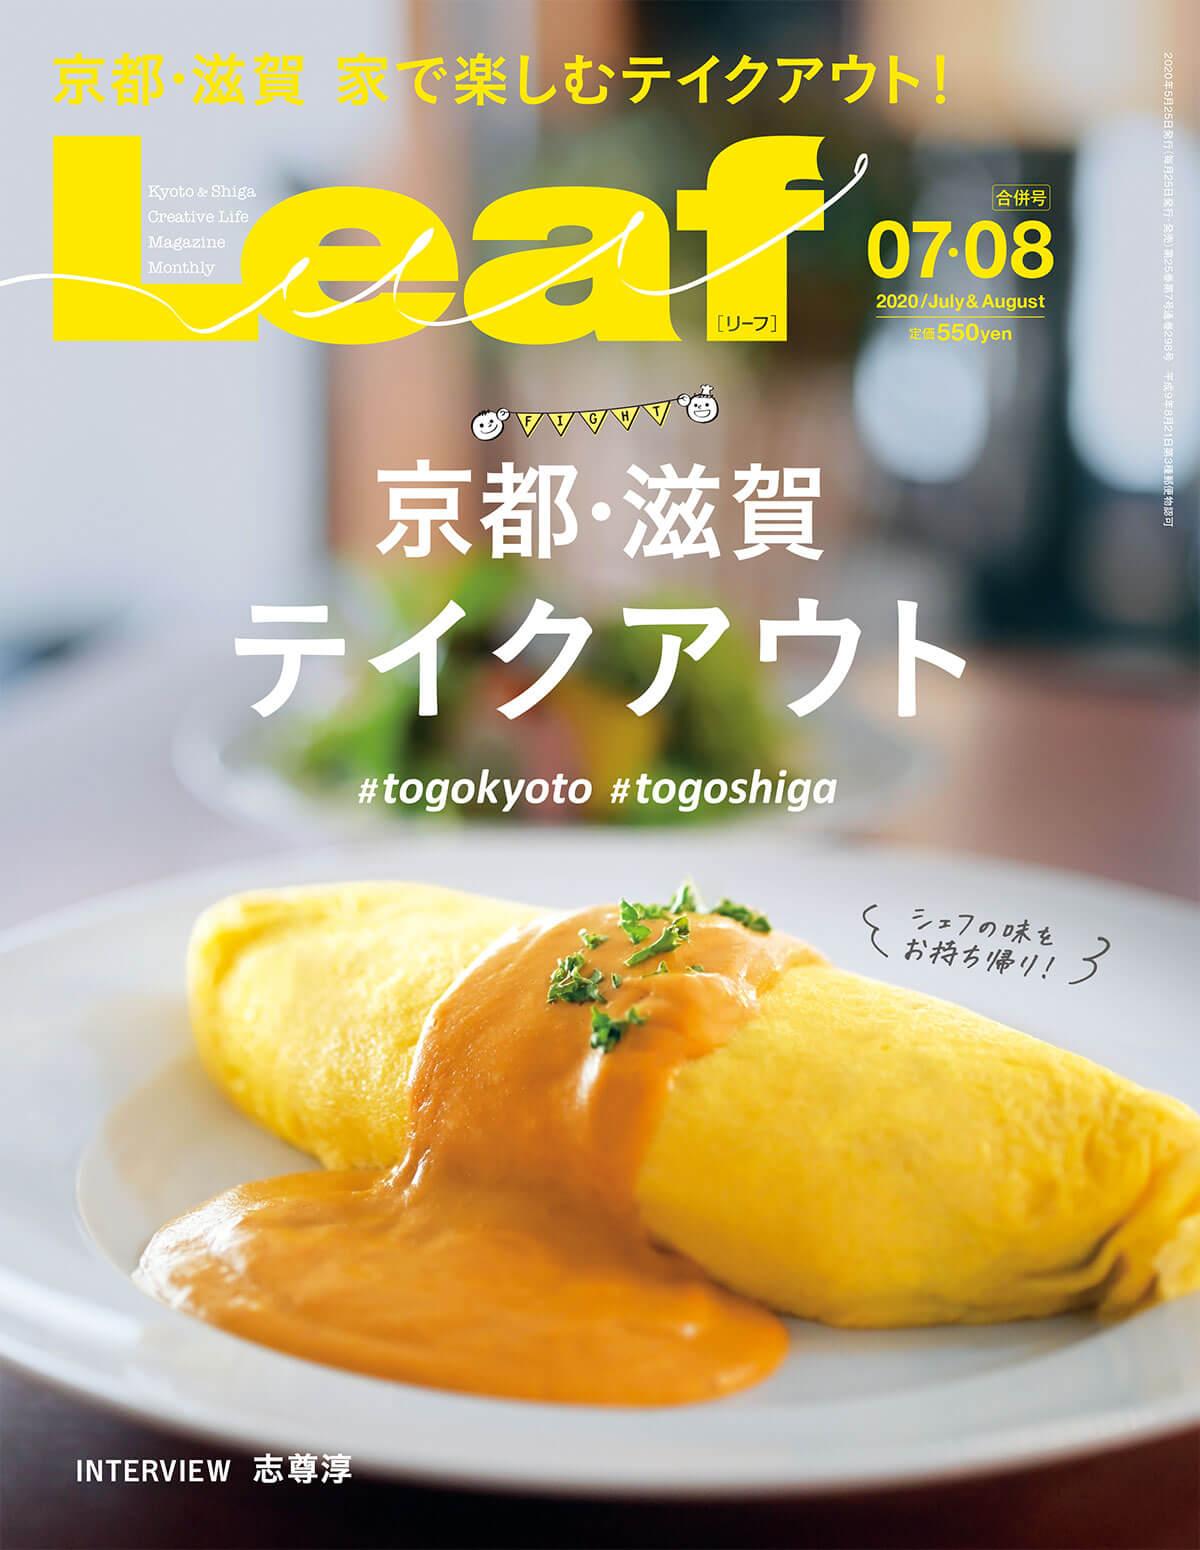 Leaf - 京都・滋賀テイクアウト